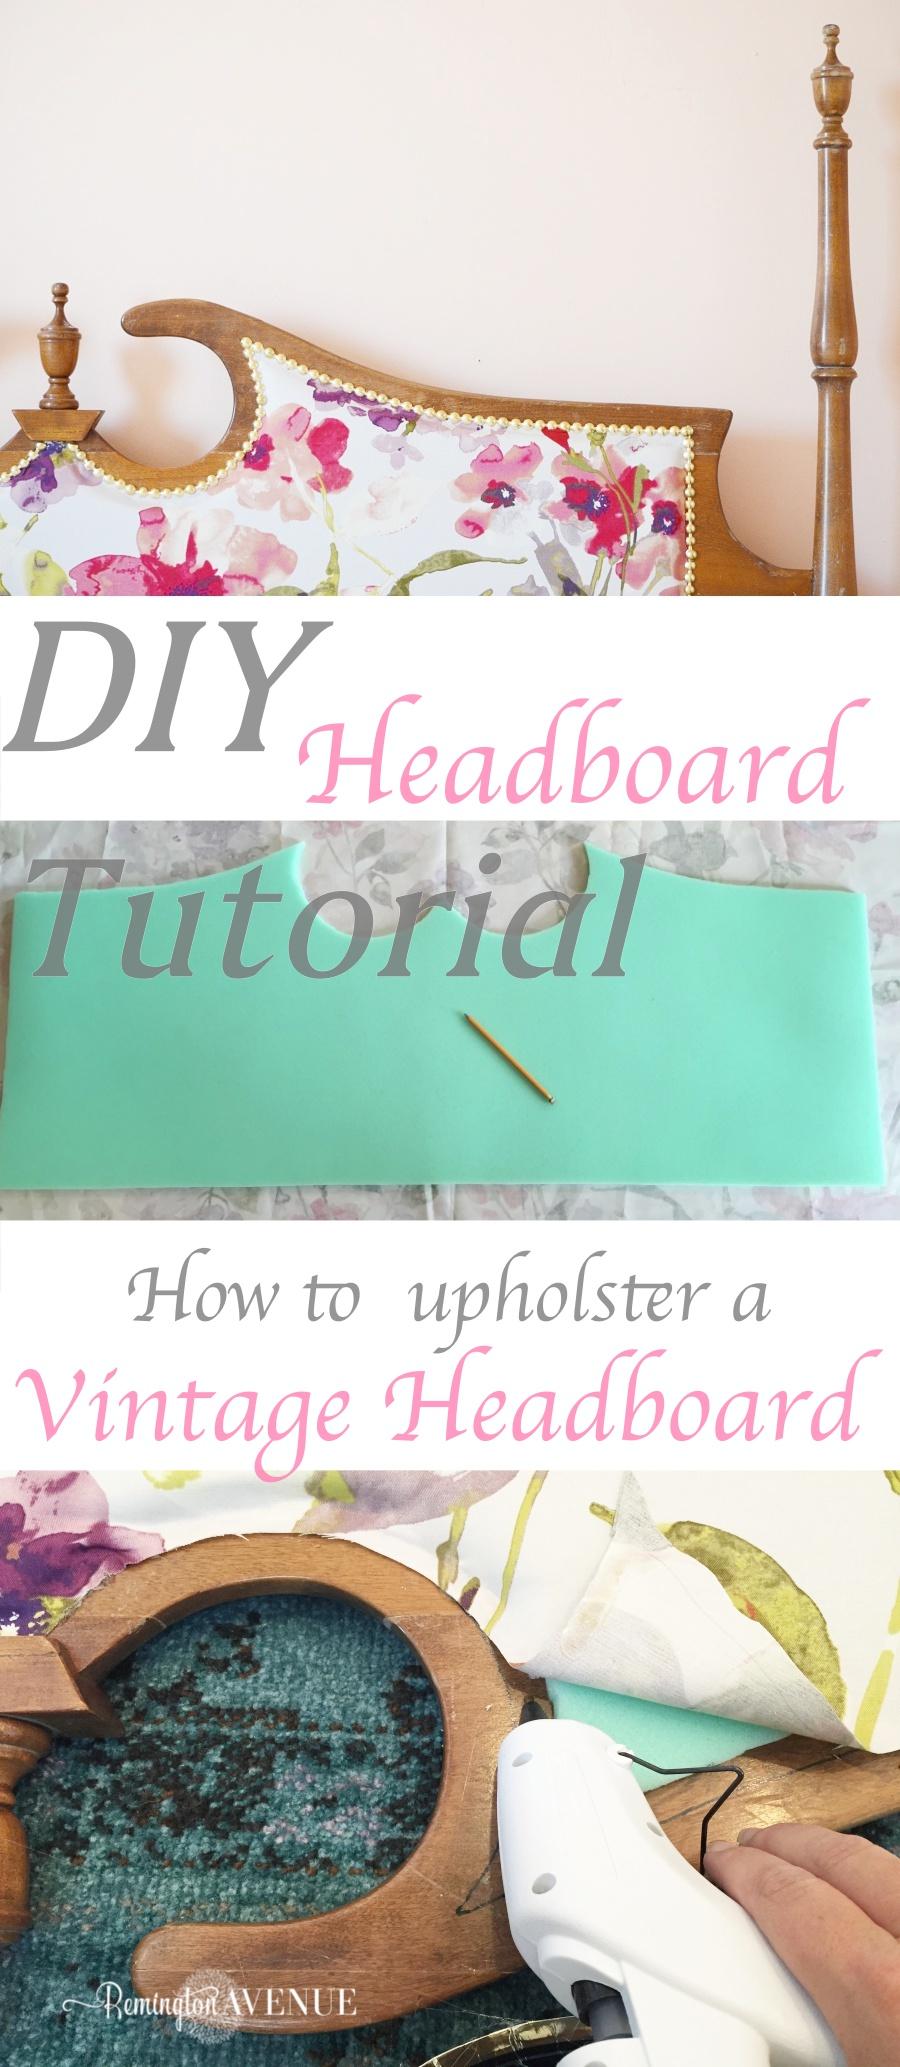 DIY upholstered vintage headboard